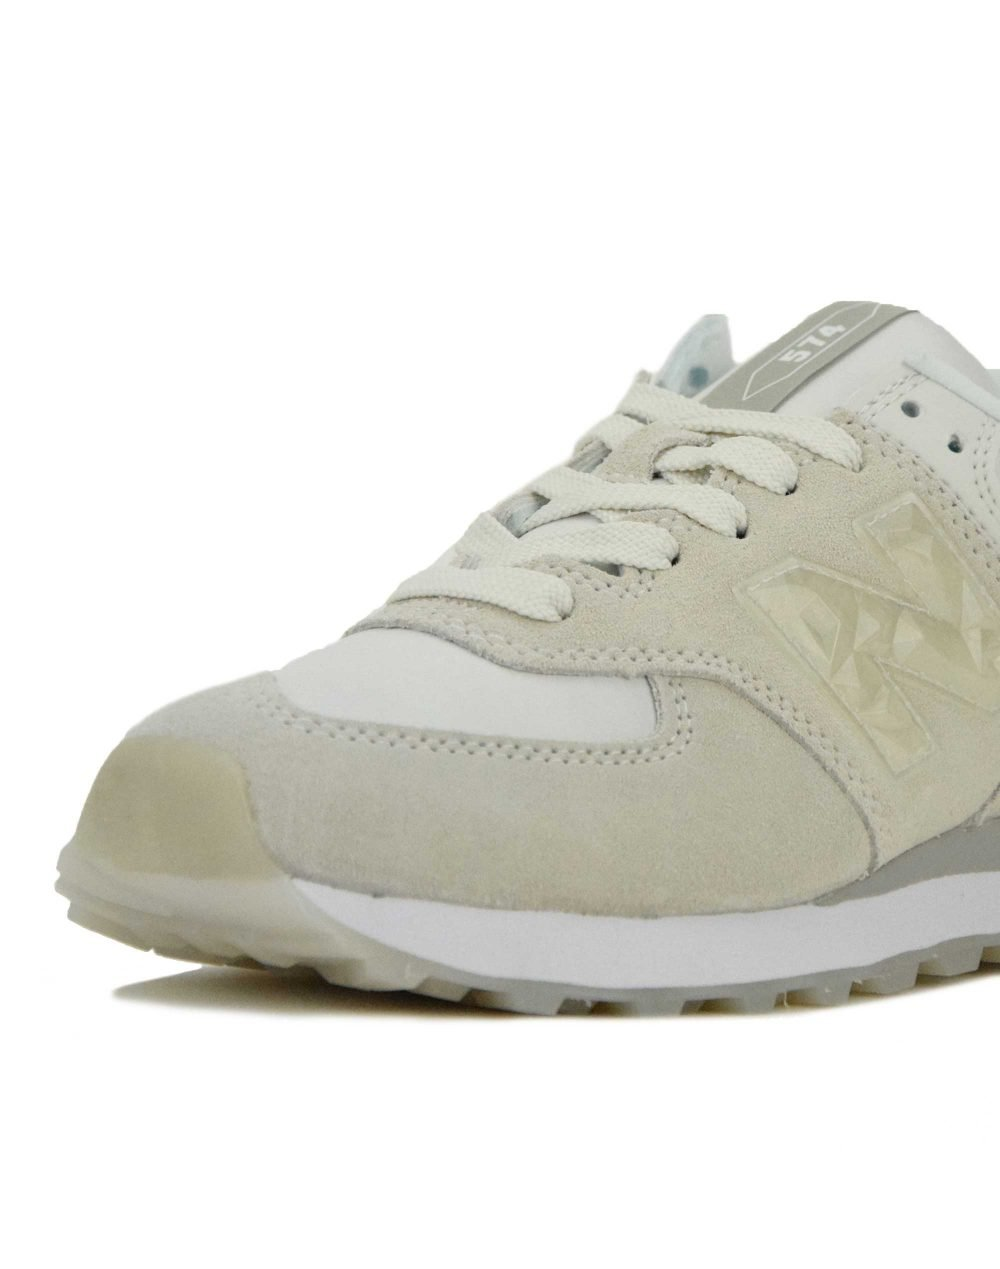 New Balance (WL574WNT) White